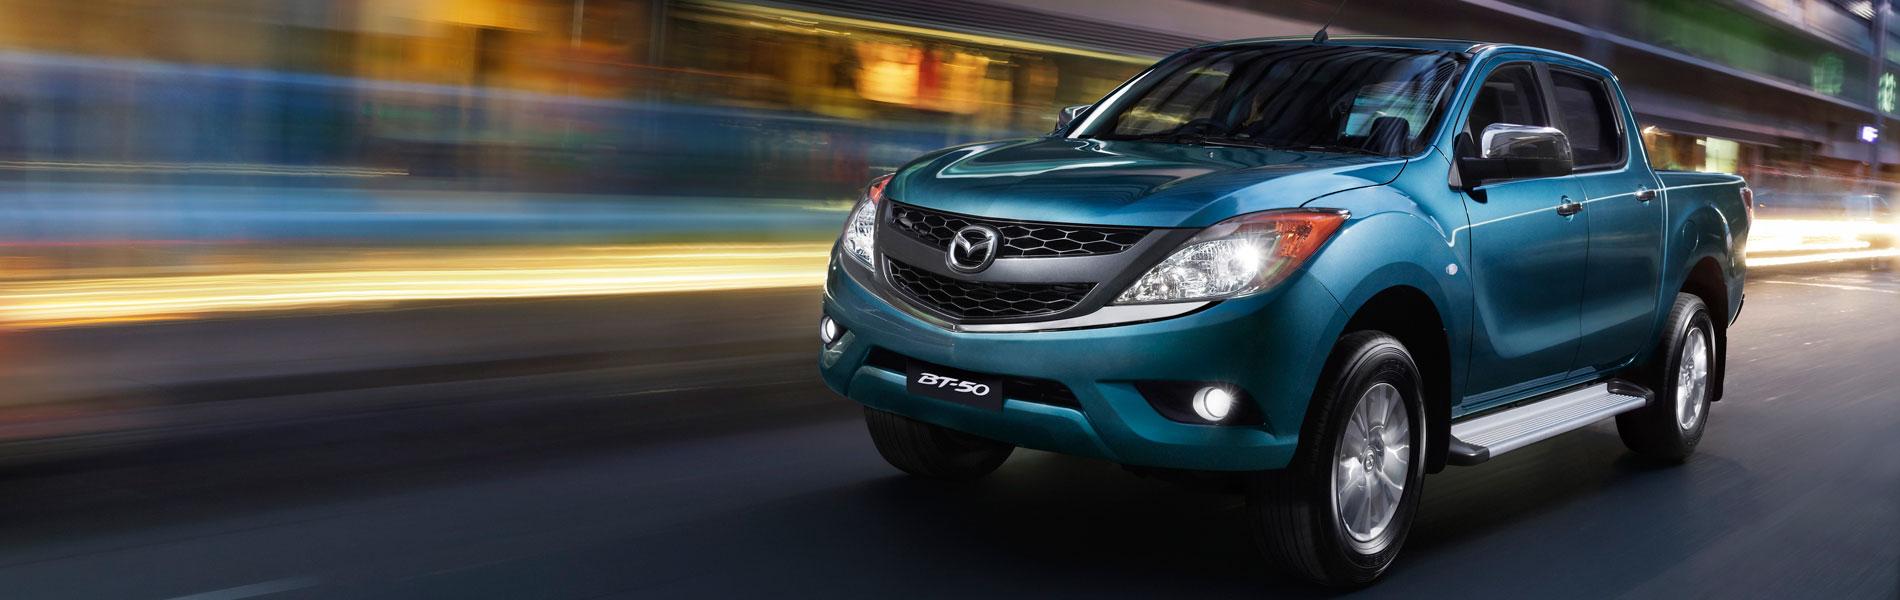 Mazda BT-50 Dual Cab Image 4